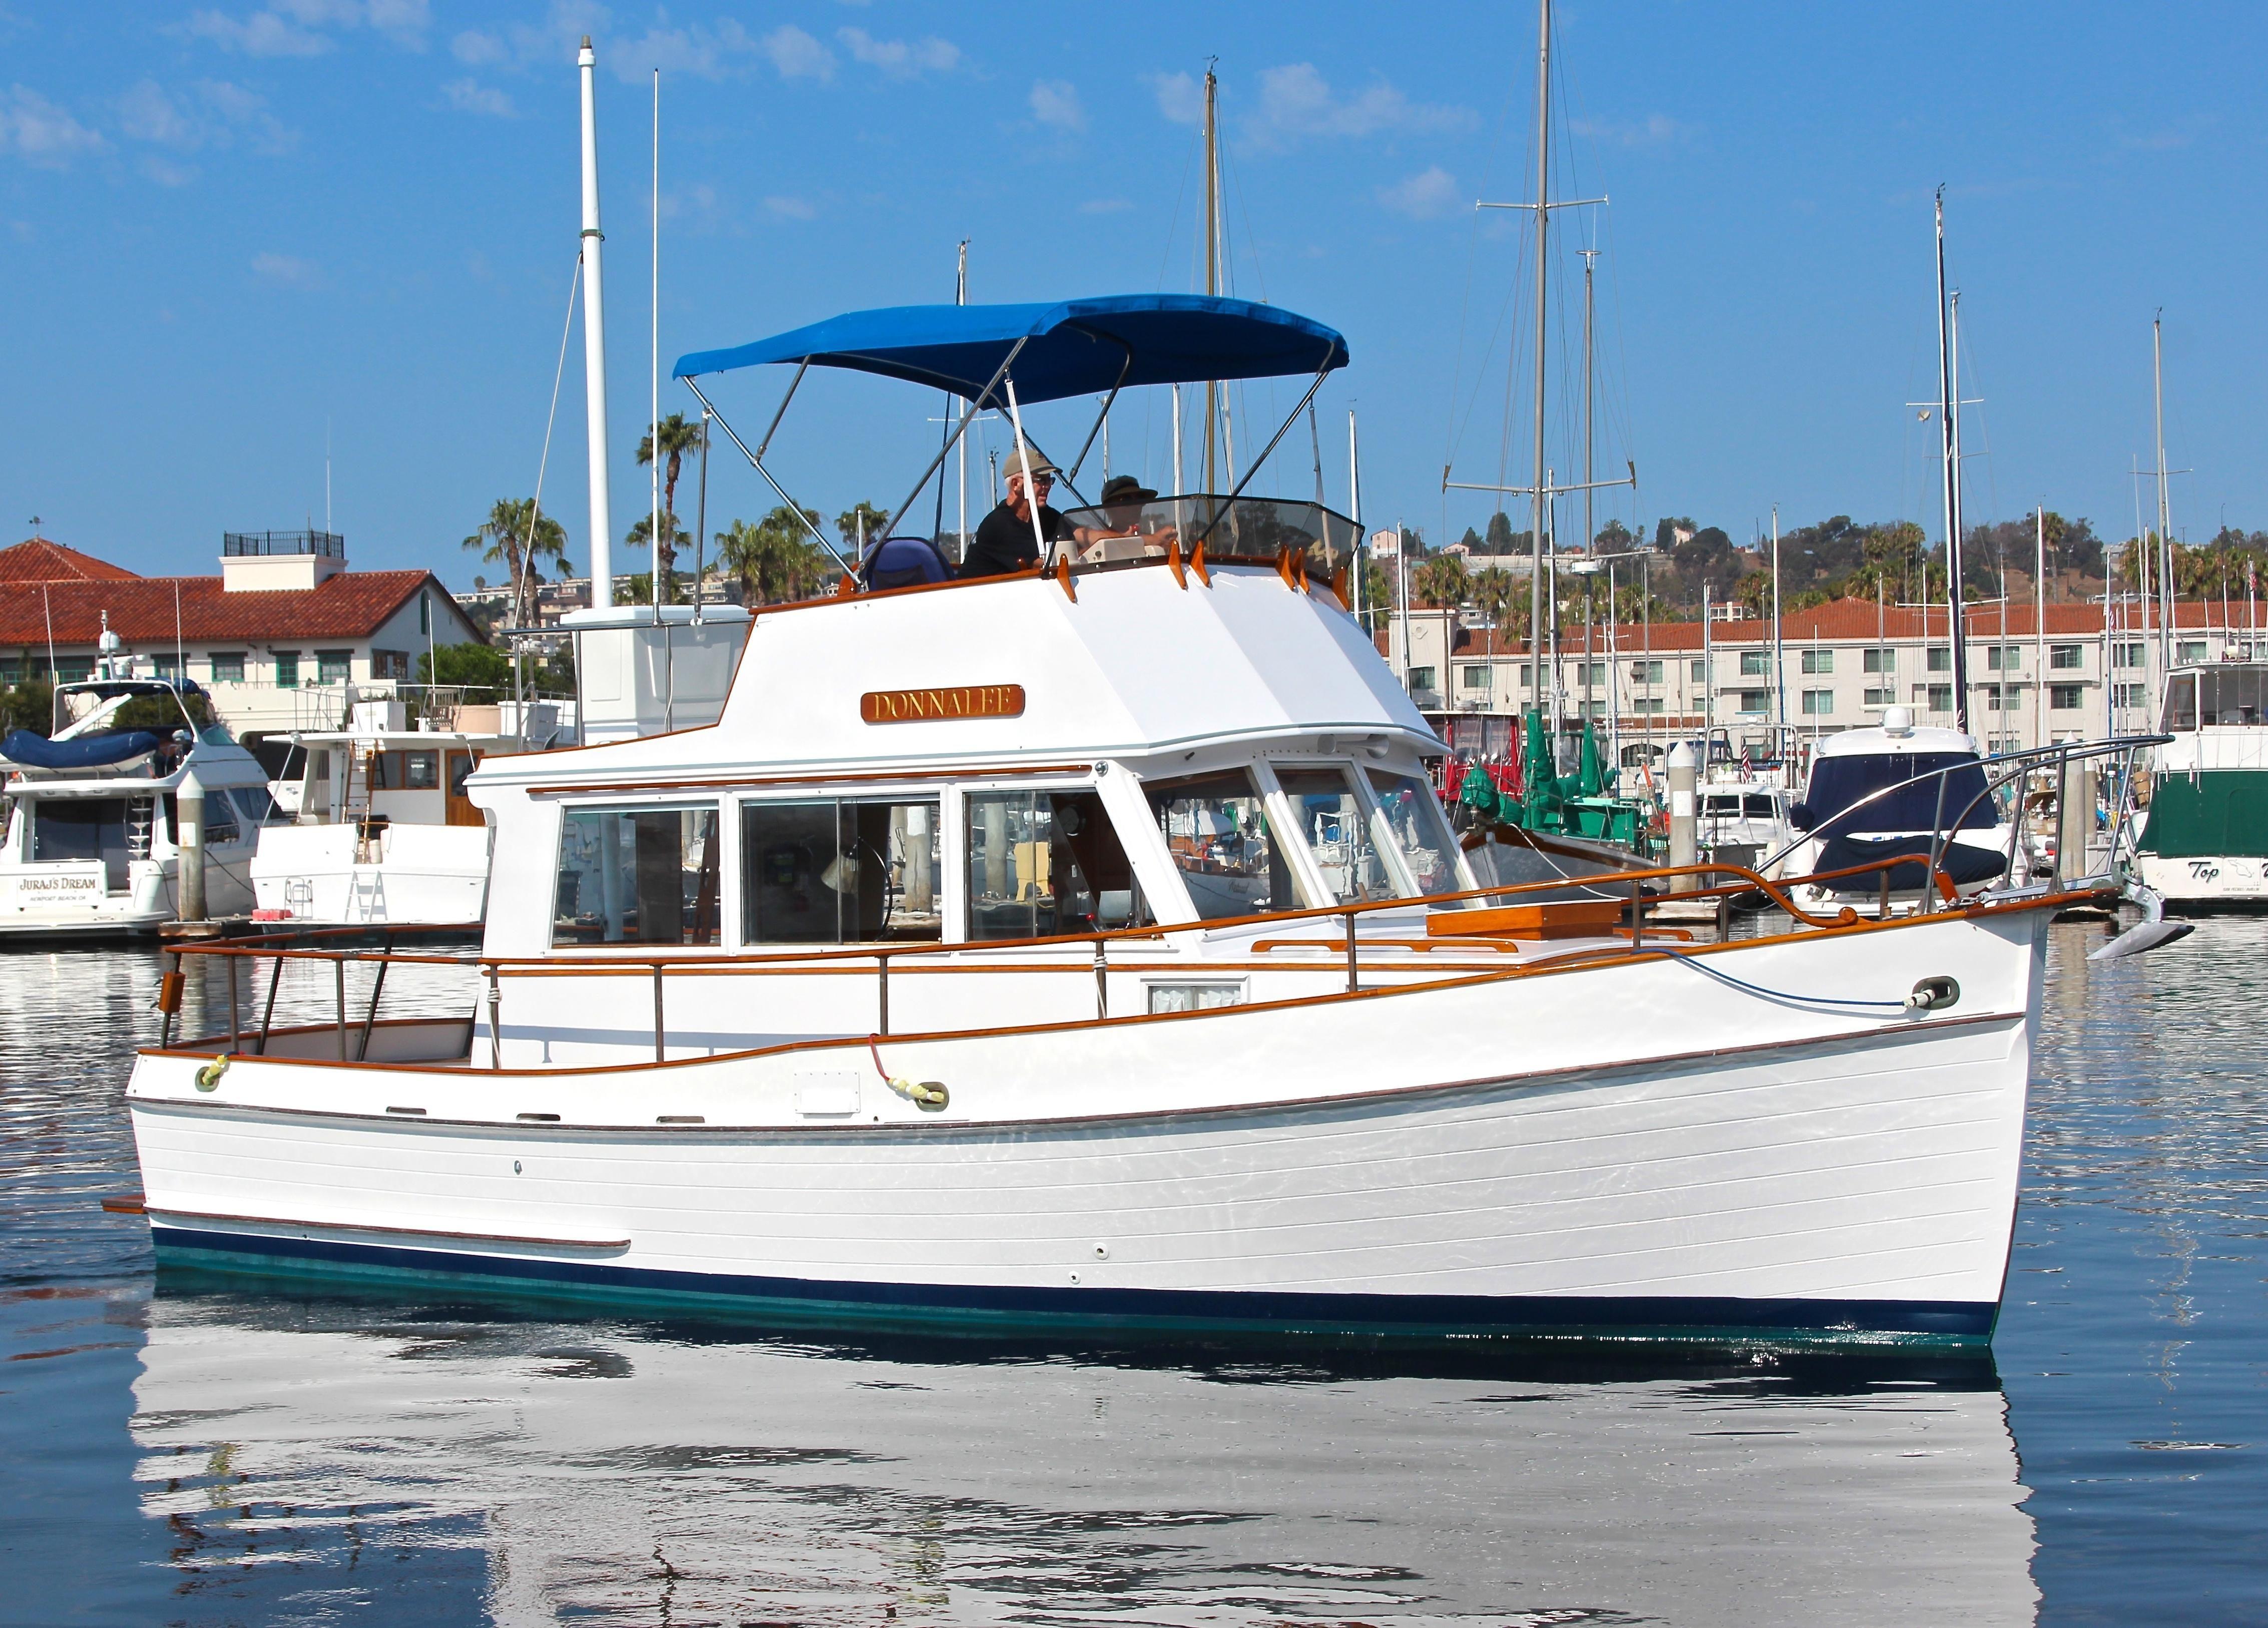 1972 Grand Banks 32 Sedan Power Boat For Sale Www Yachtworld Com